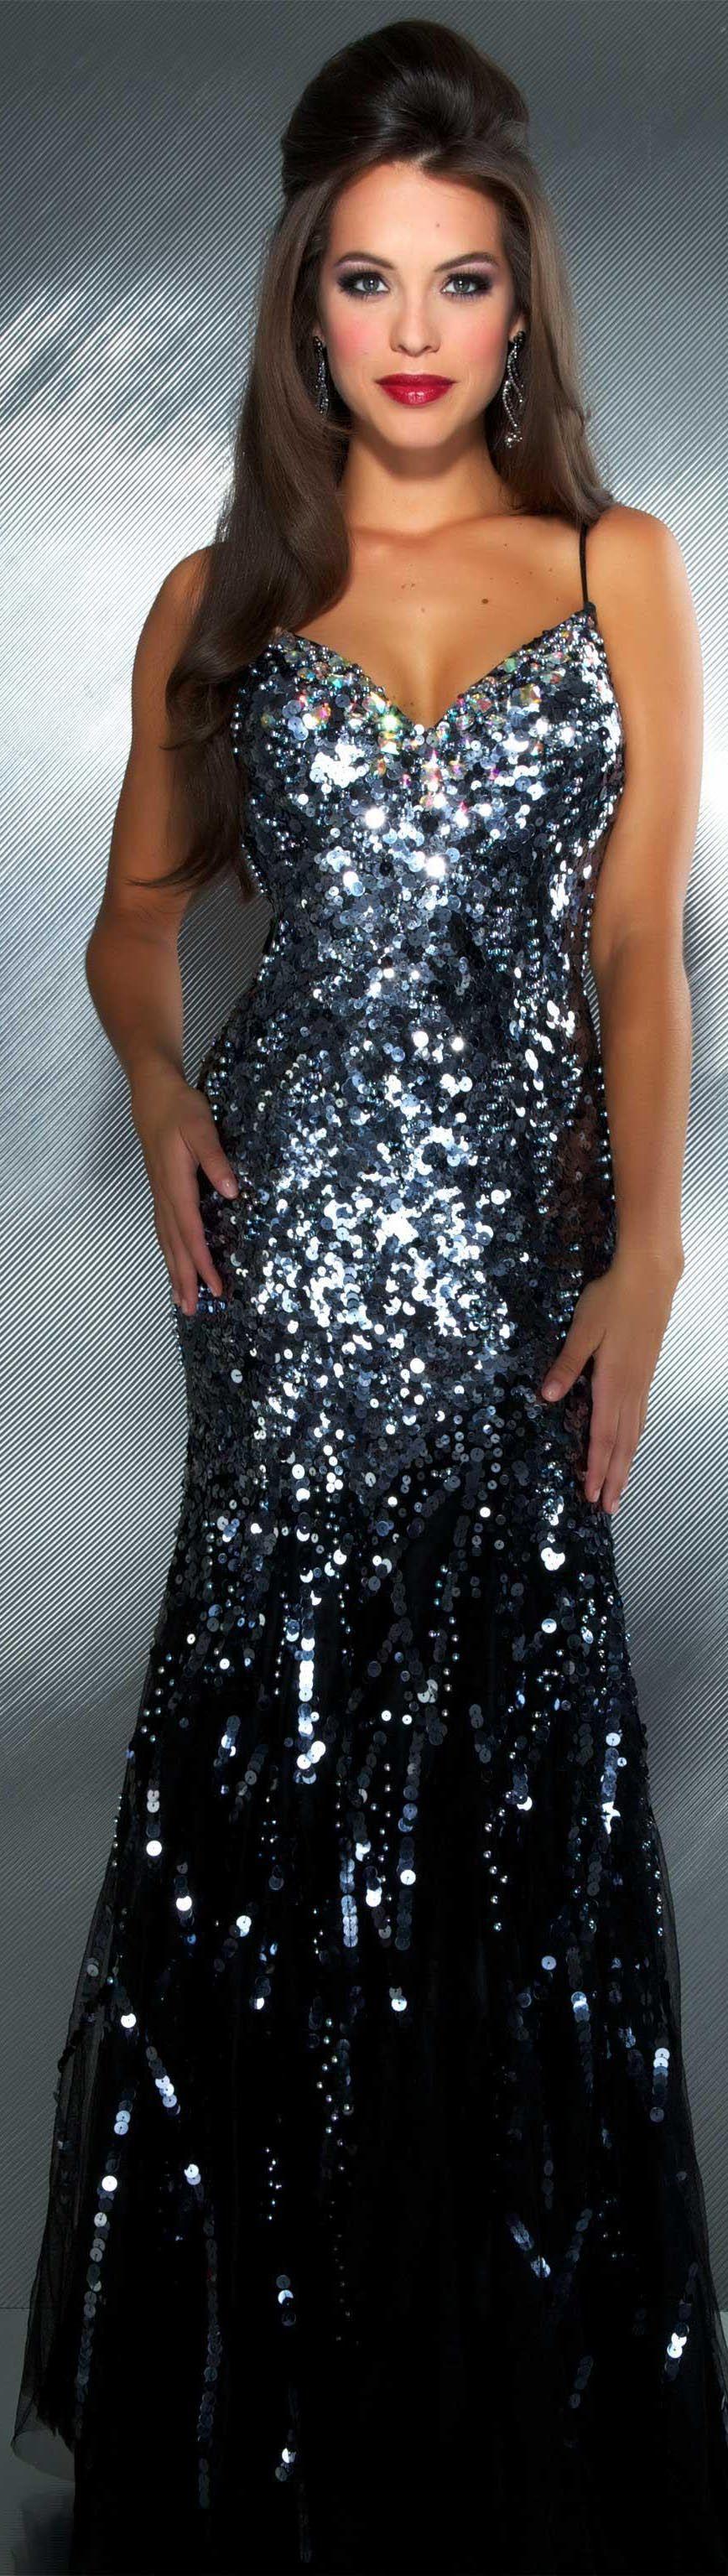 Mac duggal couture dress black gunmetal long dress glitter mac